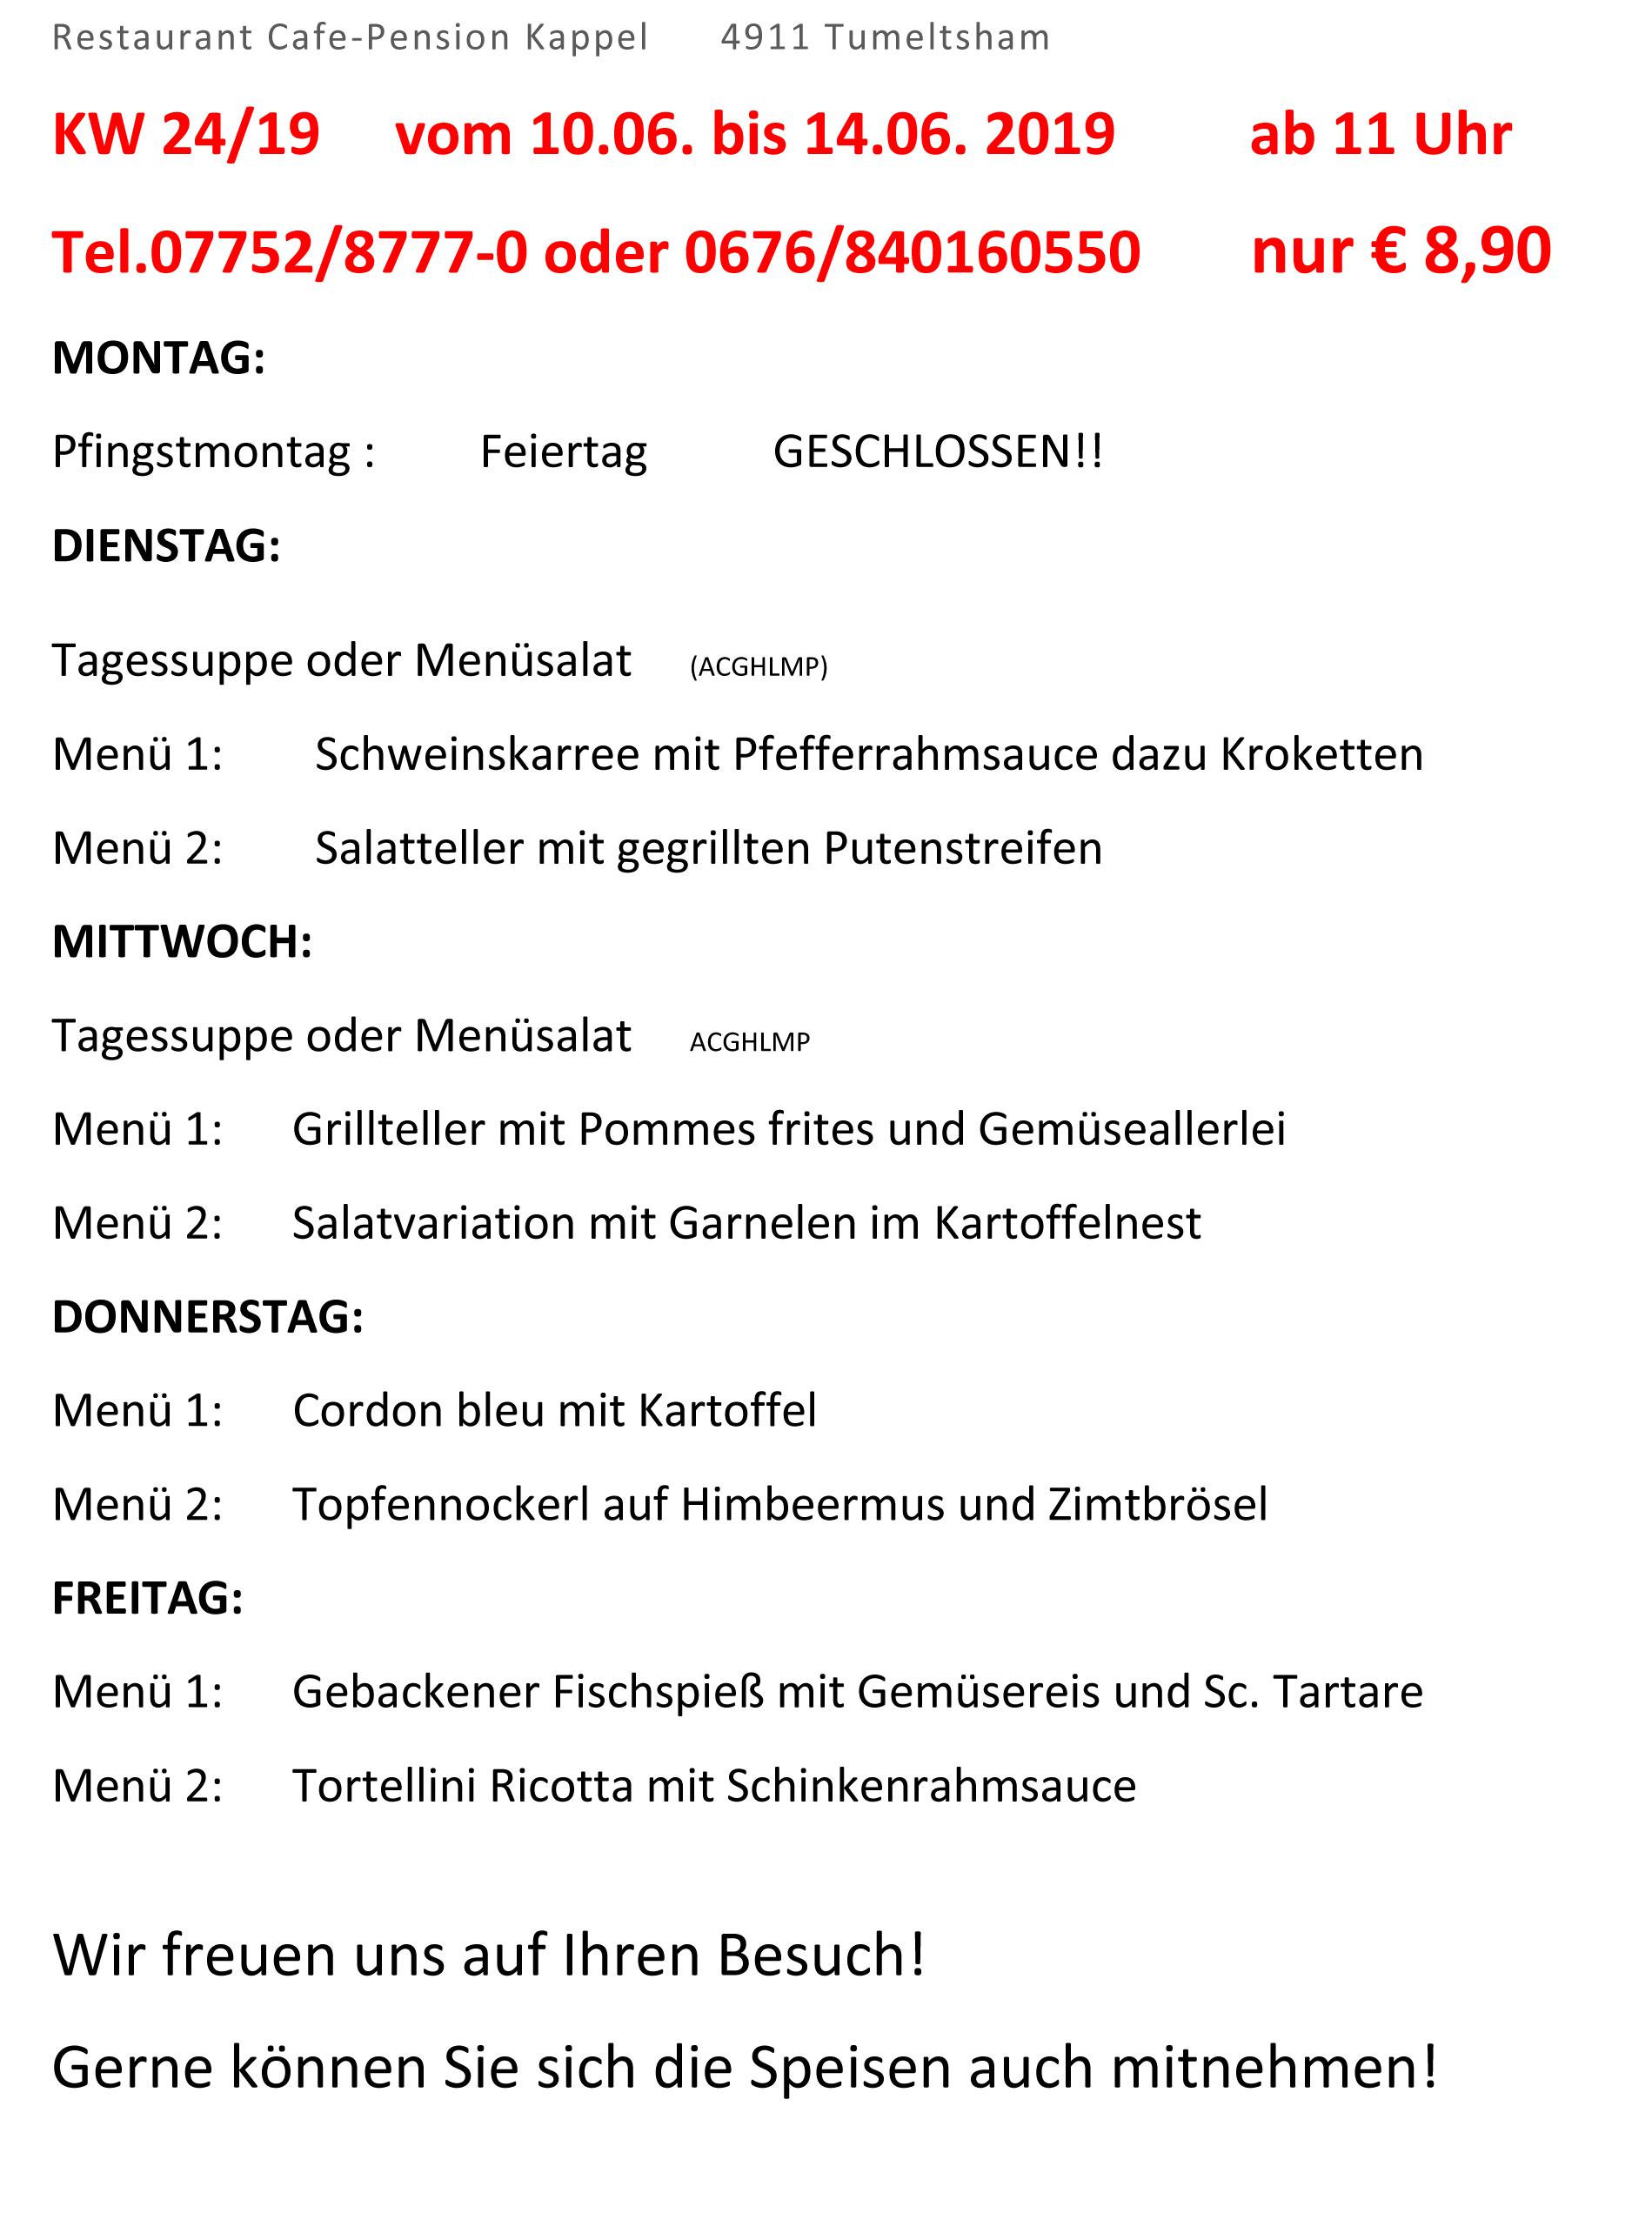 Menüplan KW 24-19docx (3)